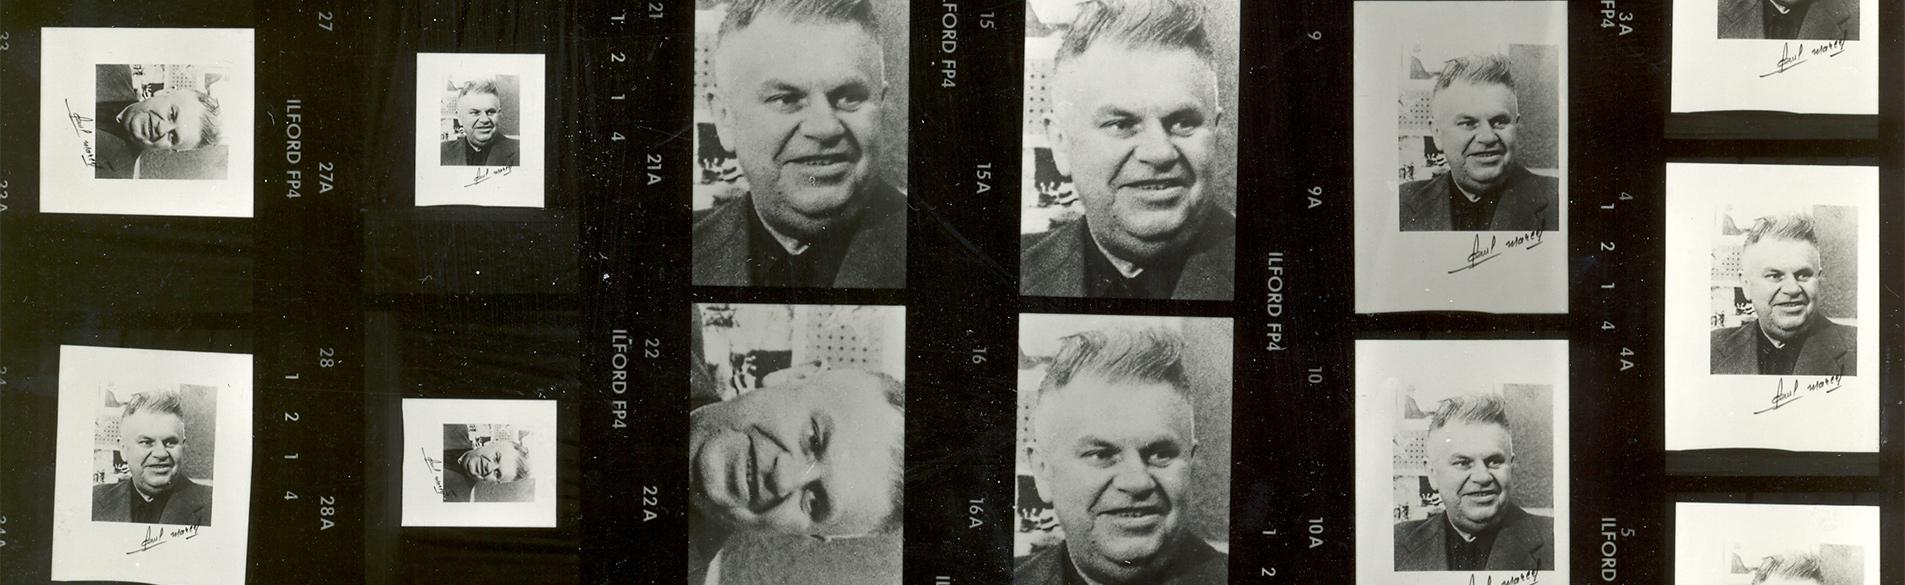 16736_-_Photos_identite_Marcel_Paul_Header-dossier